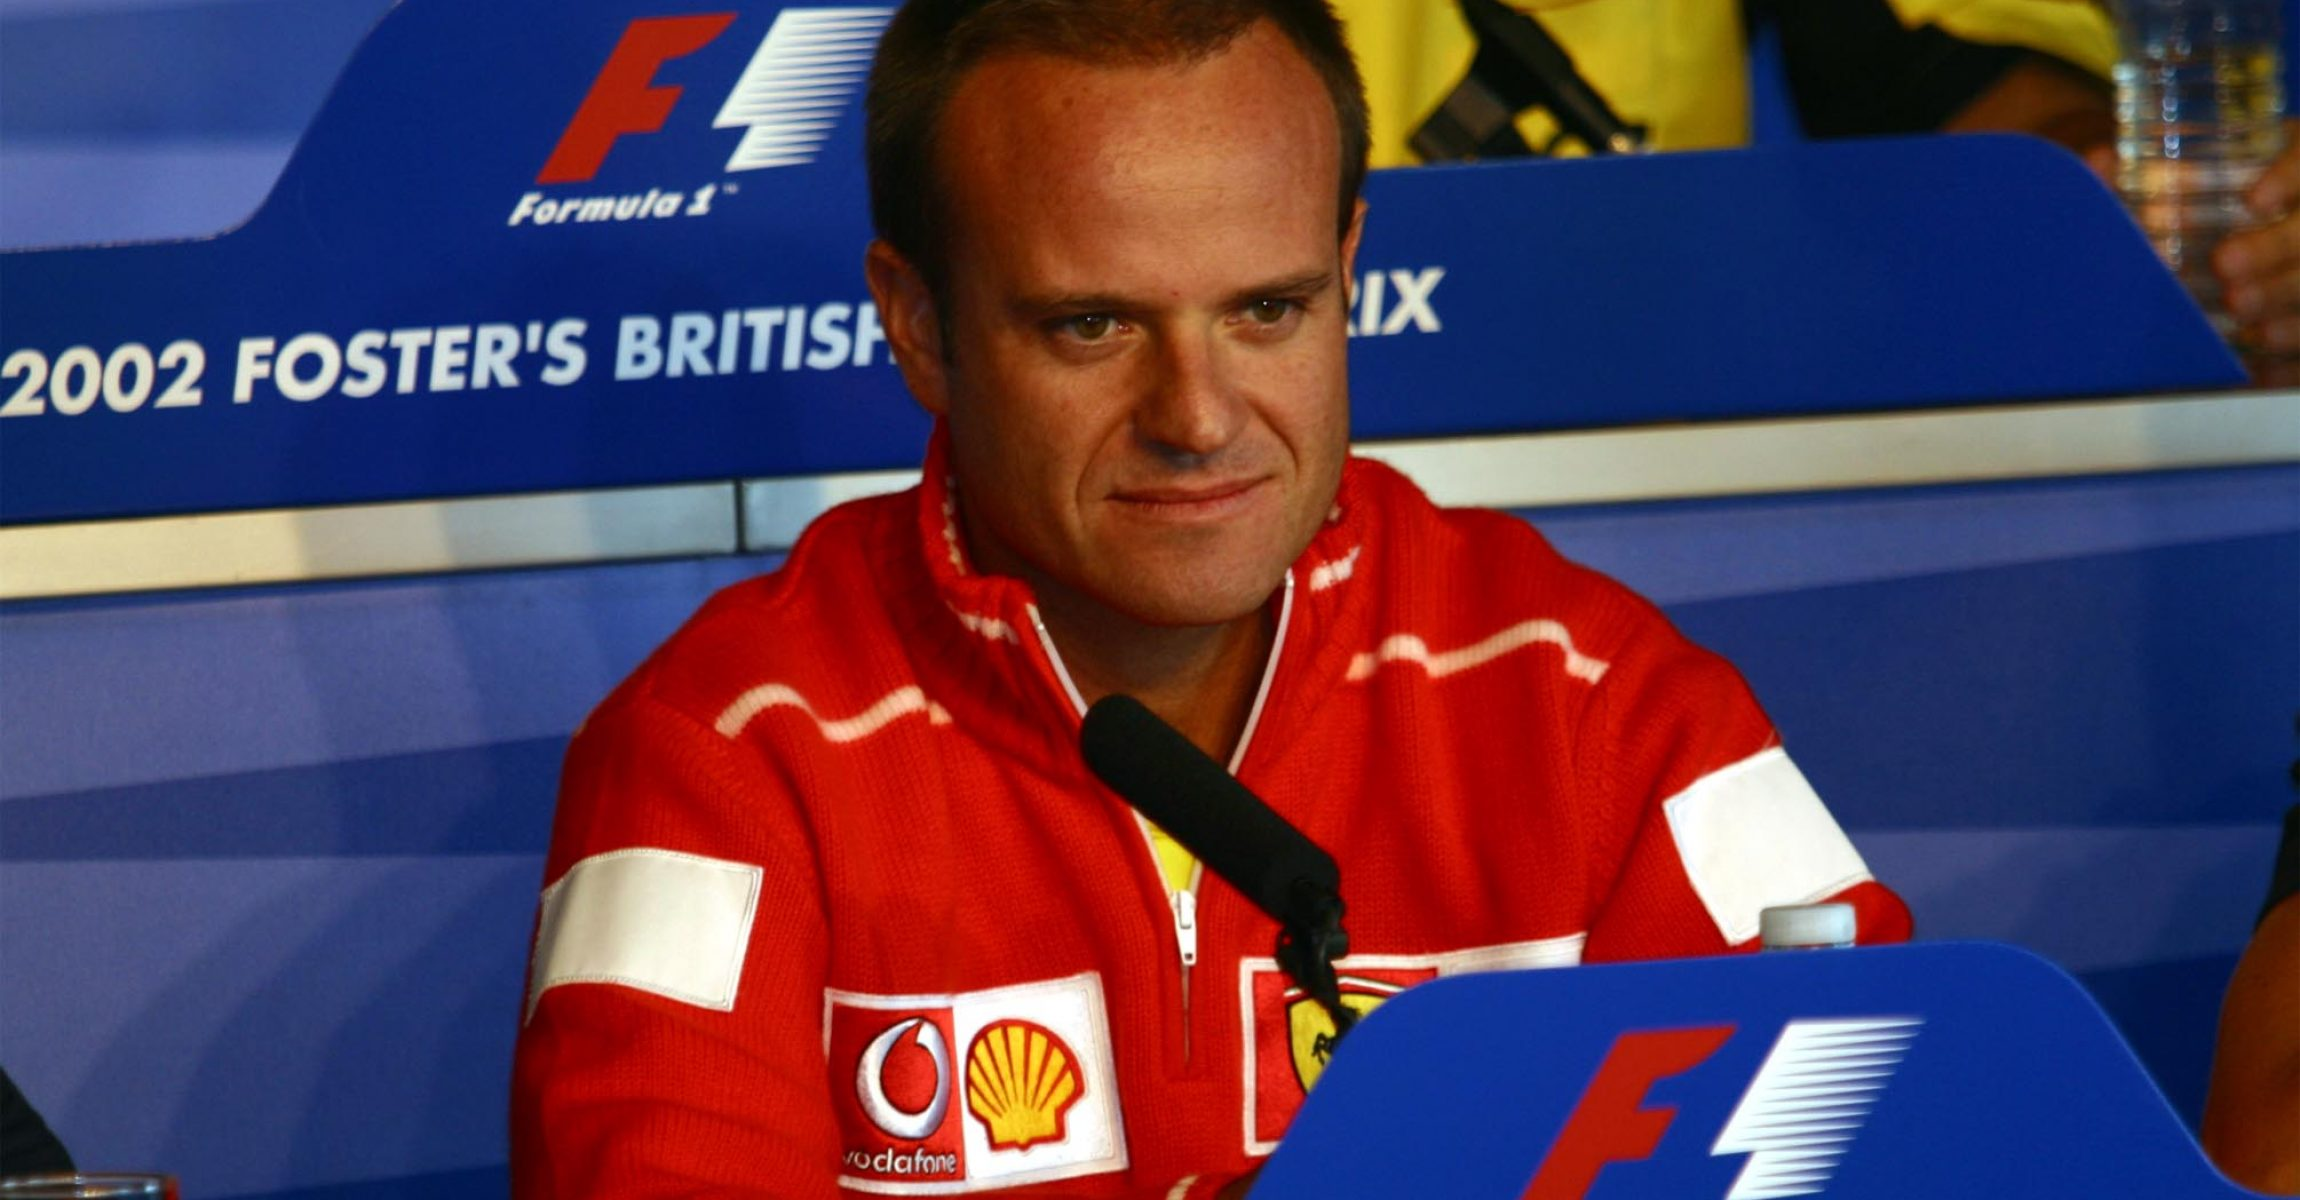 Rubens Barrichello, Ferrari, 2002 British Grand Prix, Silverstone